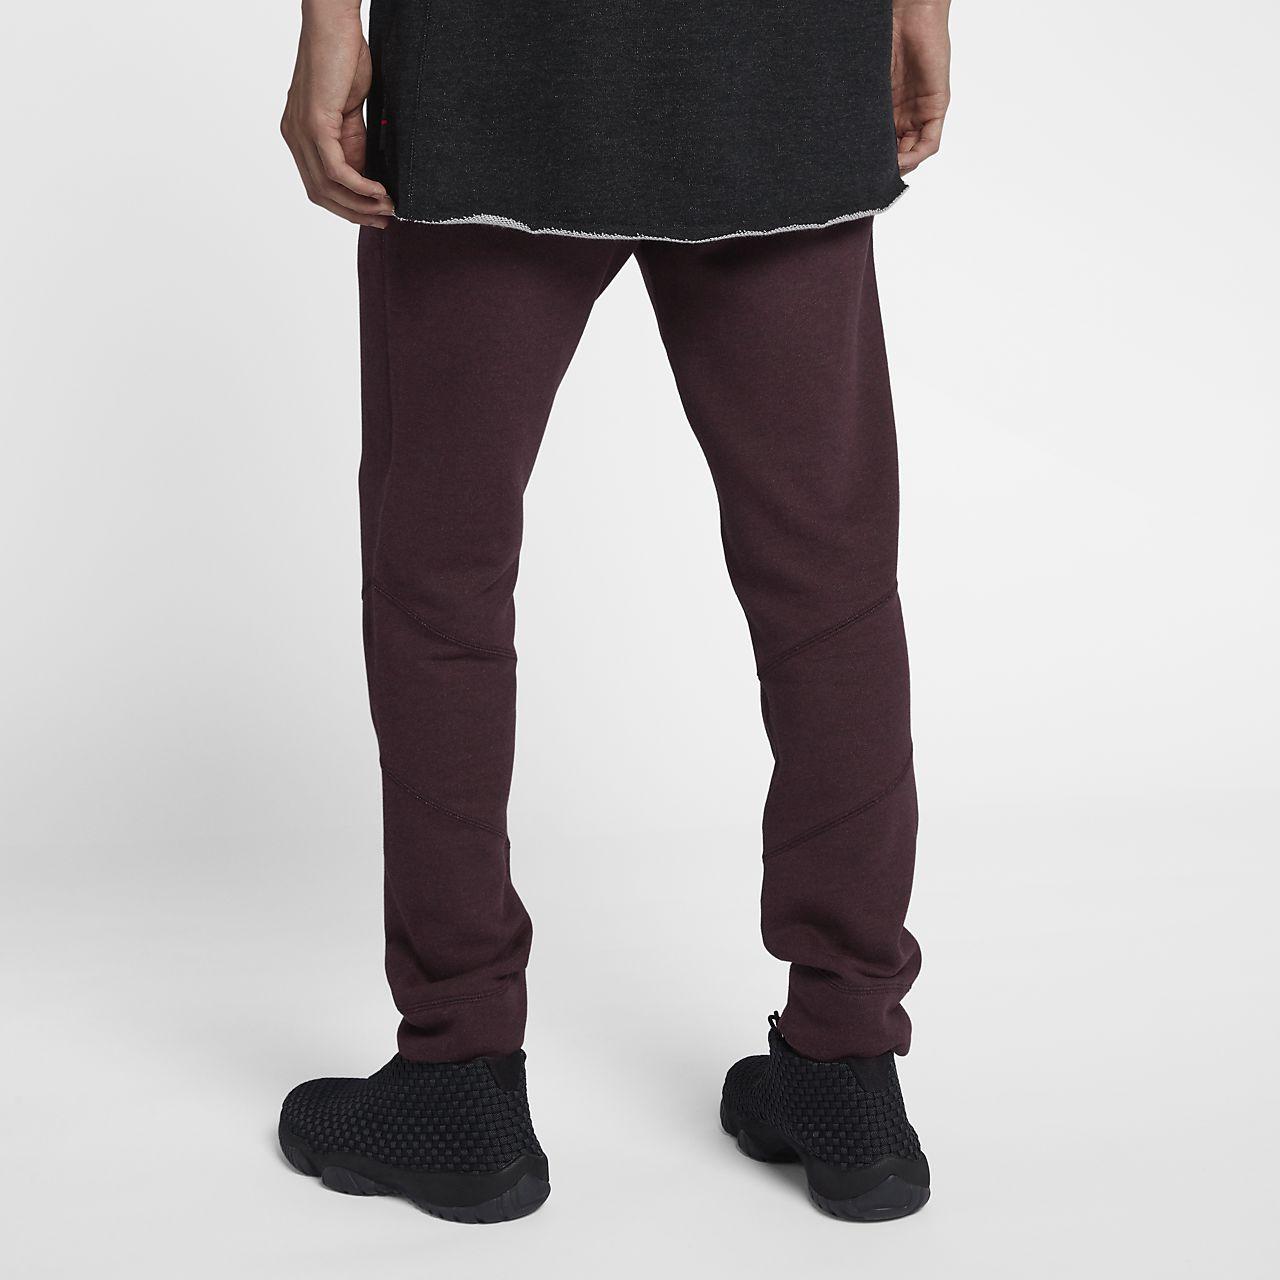 64977b88194a Jordan Lifestyle Wings Men s Fleece Trousers. Nike.com LU